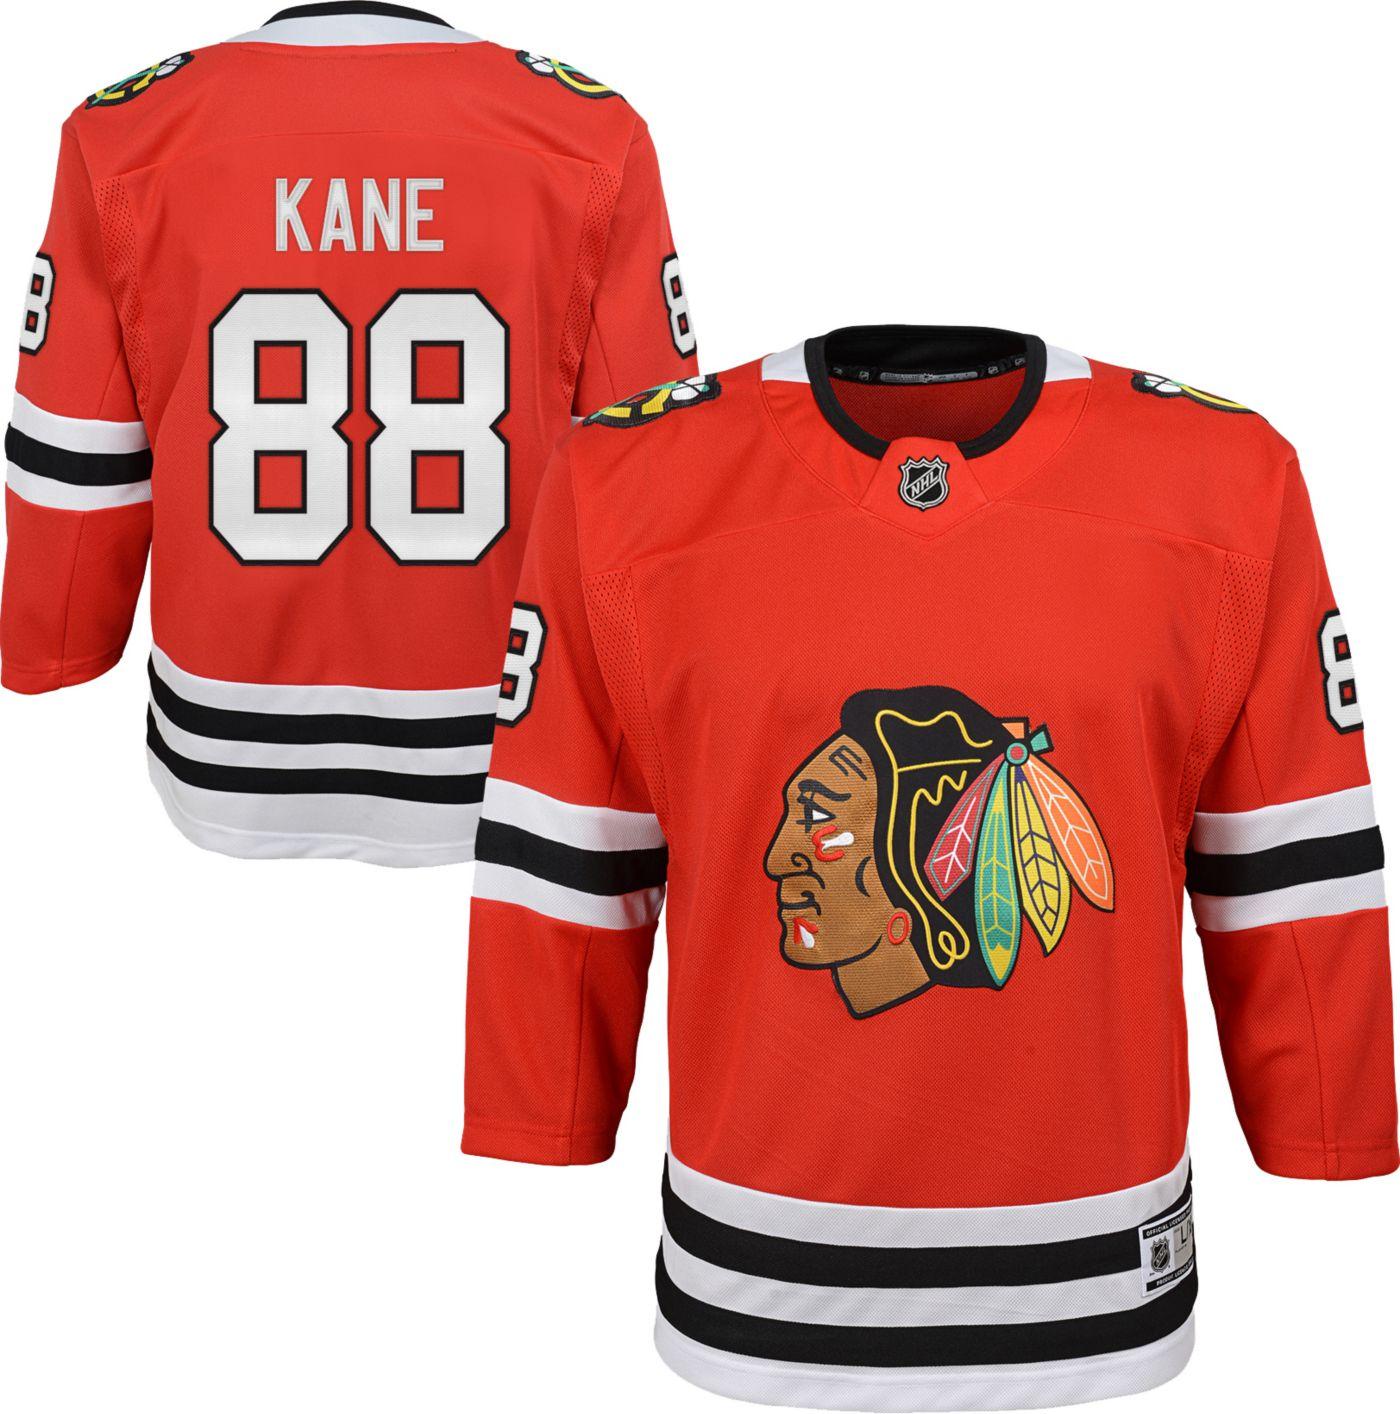 NHL Youth Chicago Blackhawks Patrick Kane #88 Premier Home Jersey